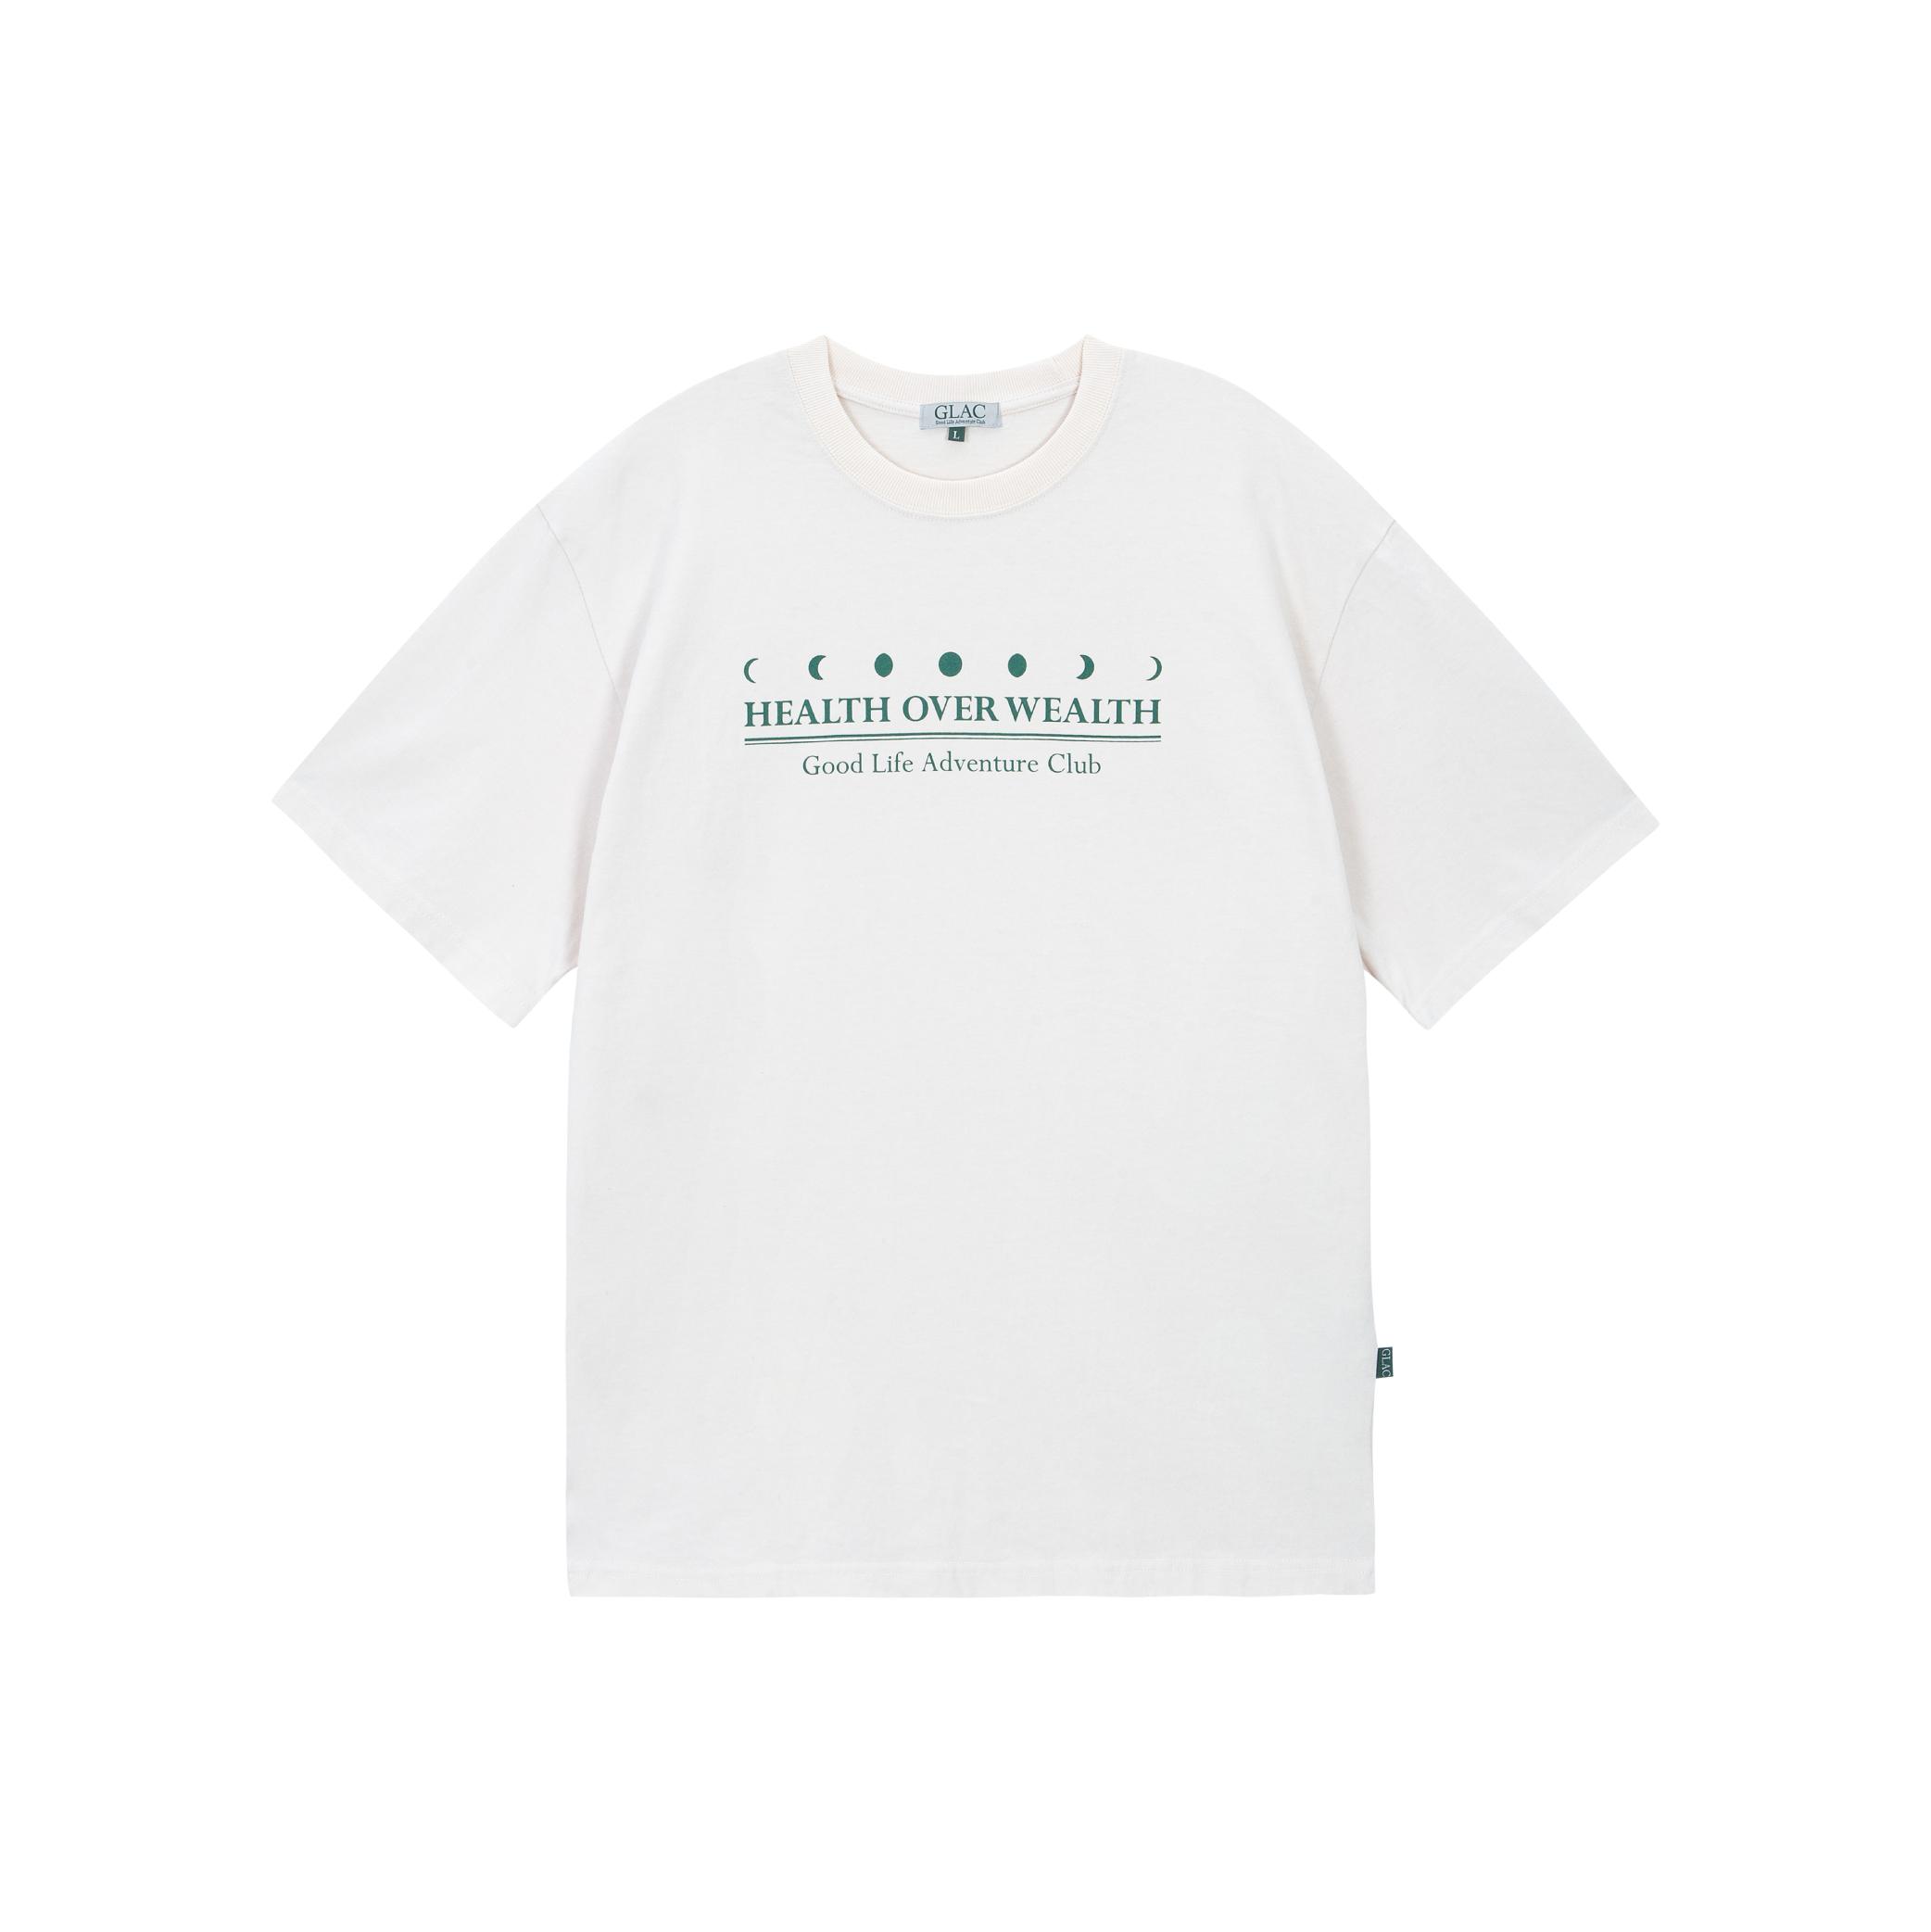 GLAC 1/2 T-Shirt Ver.3